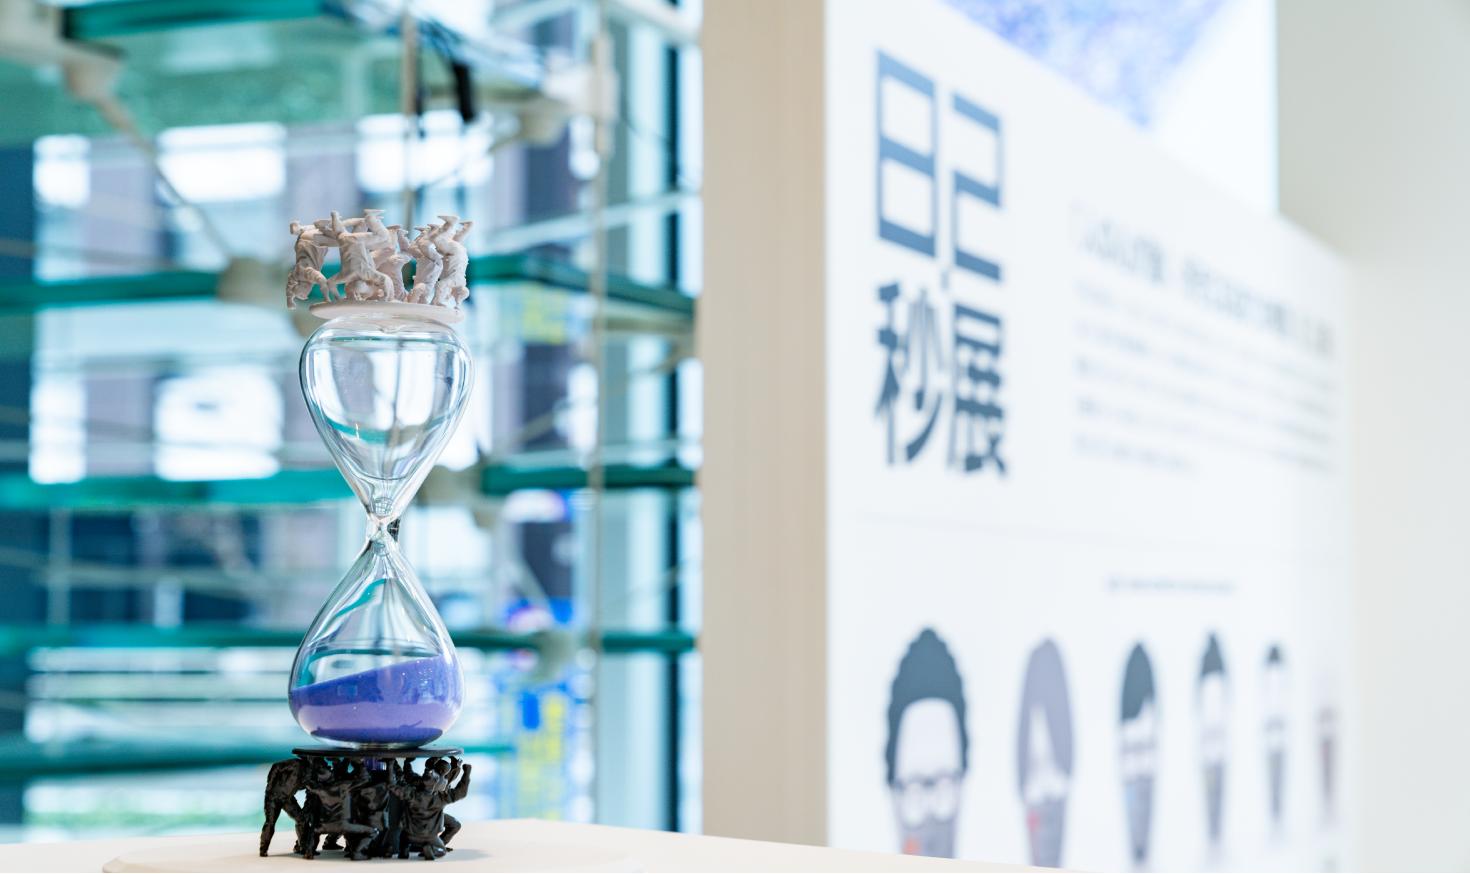 AGC Studioのラスト展示「8.2秒展」から見えてきた  デザイナーとメーカーの協創のあり方